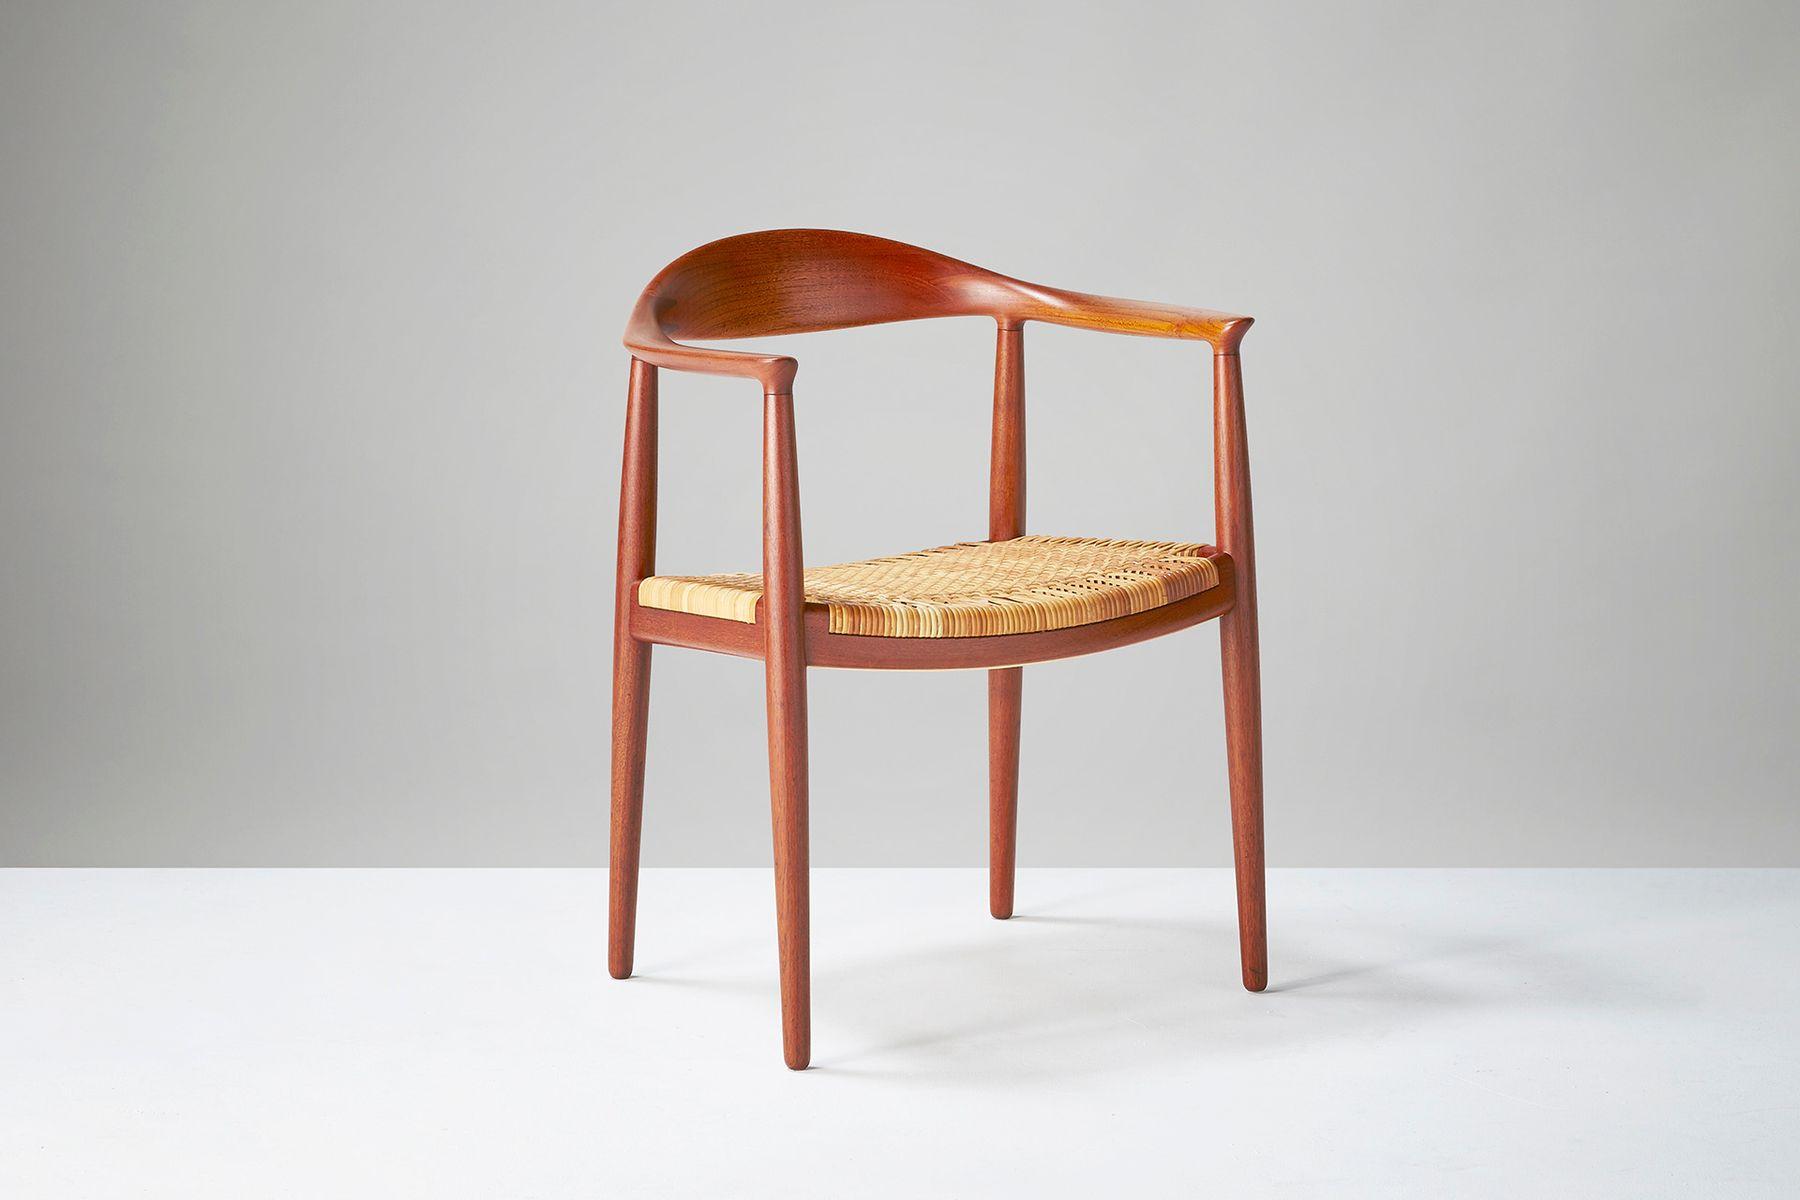 hans j wegner furniture. vintage jh-501 the chair by hans j. wegner for johannes hansen j furniture g